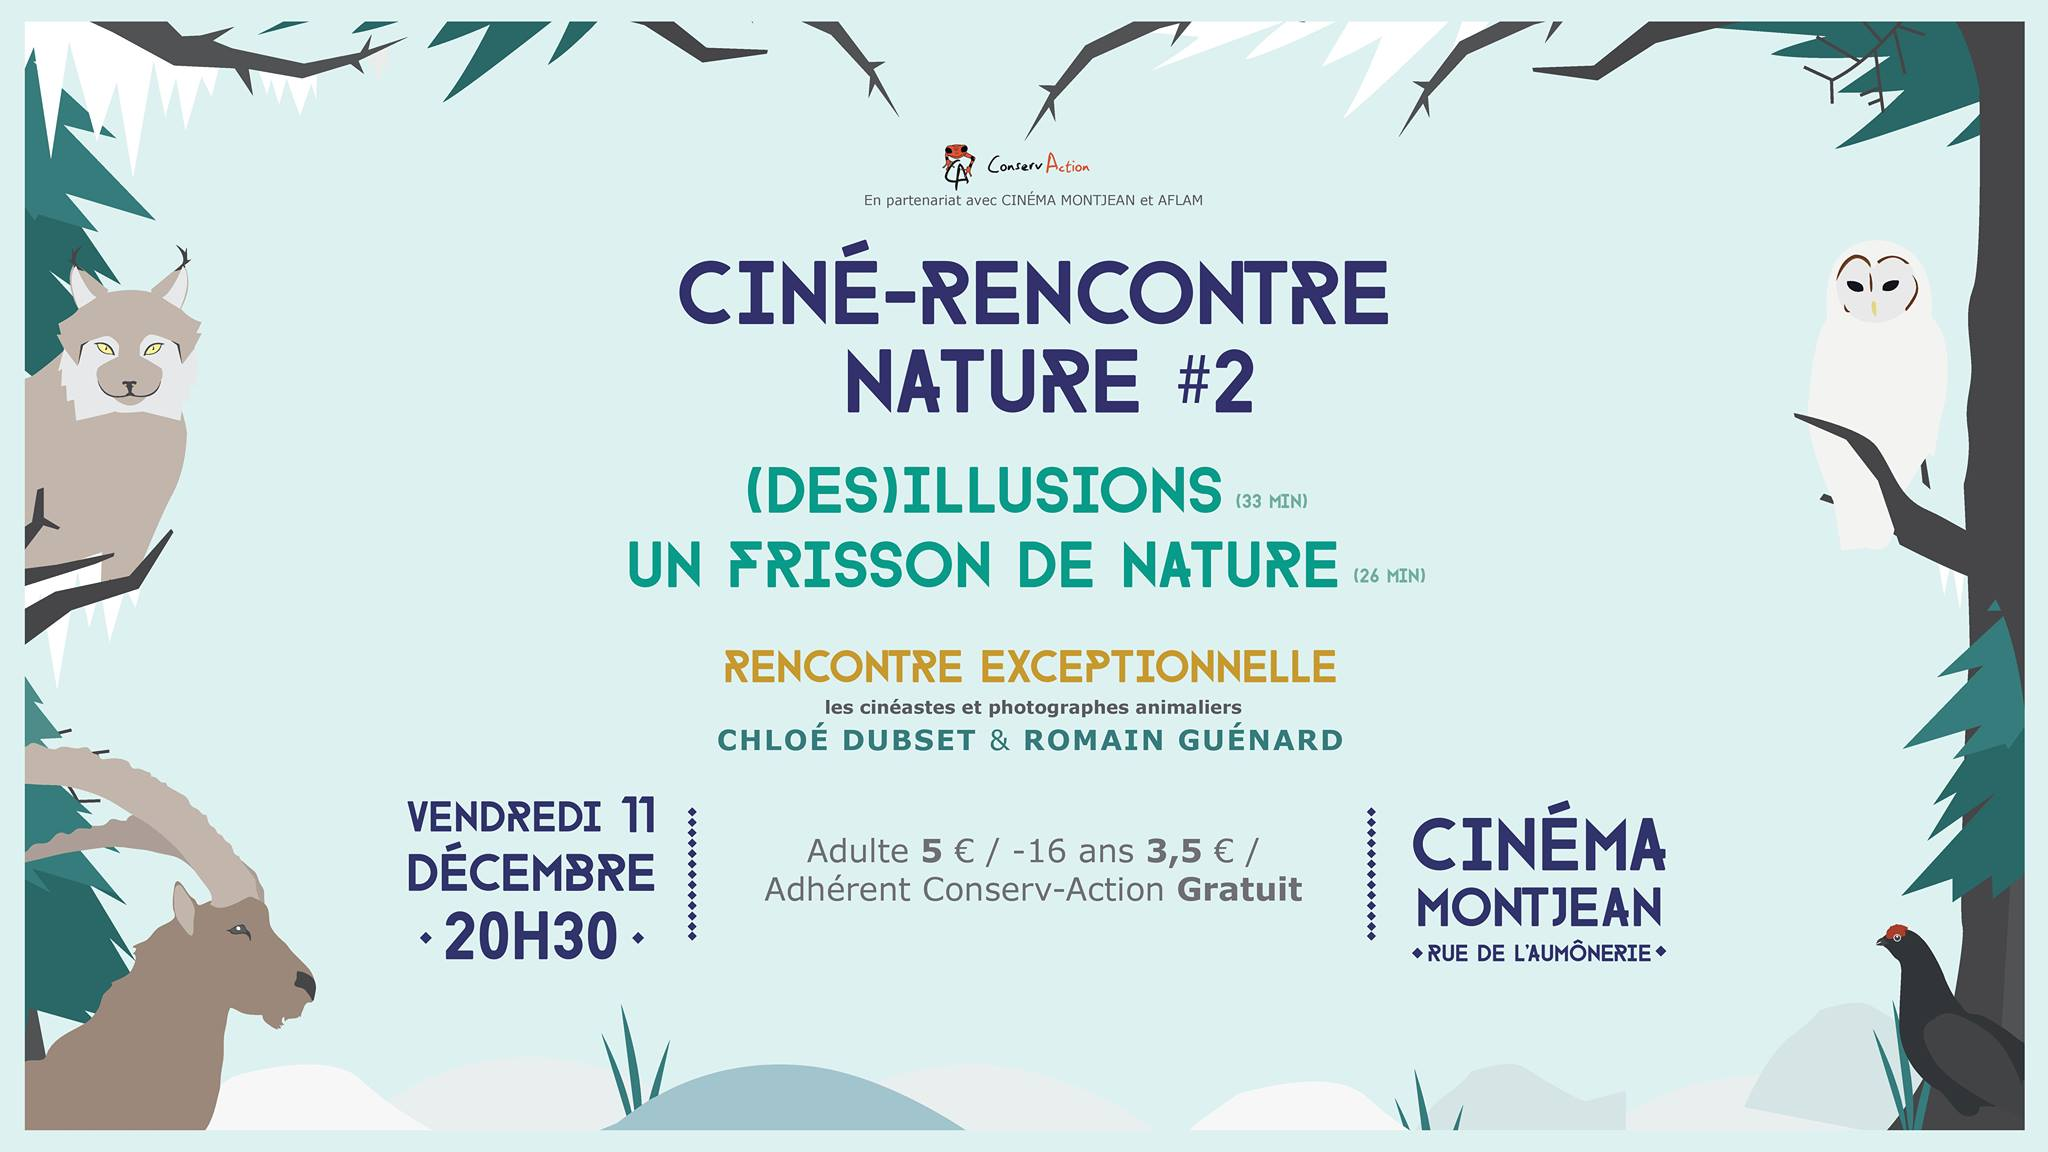 CINE RENCONTRE NATURE #2